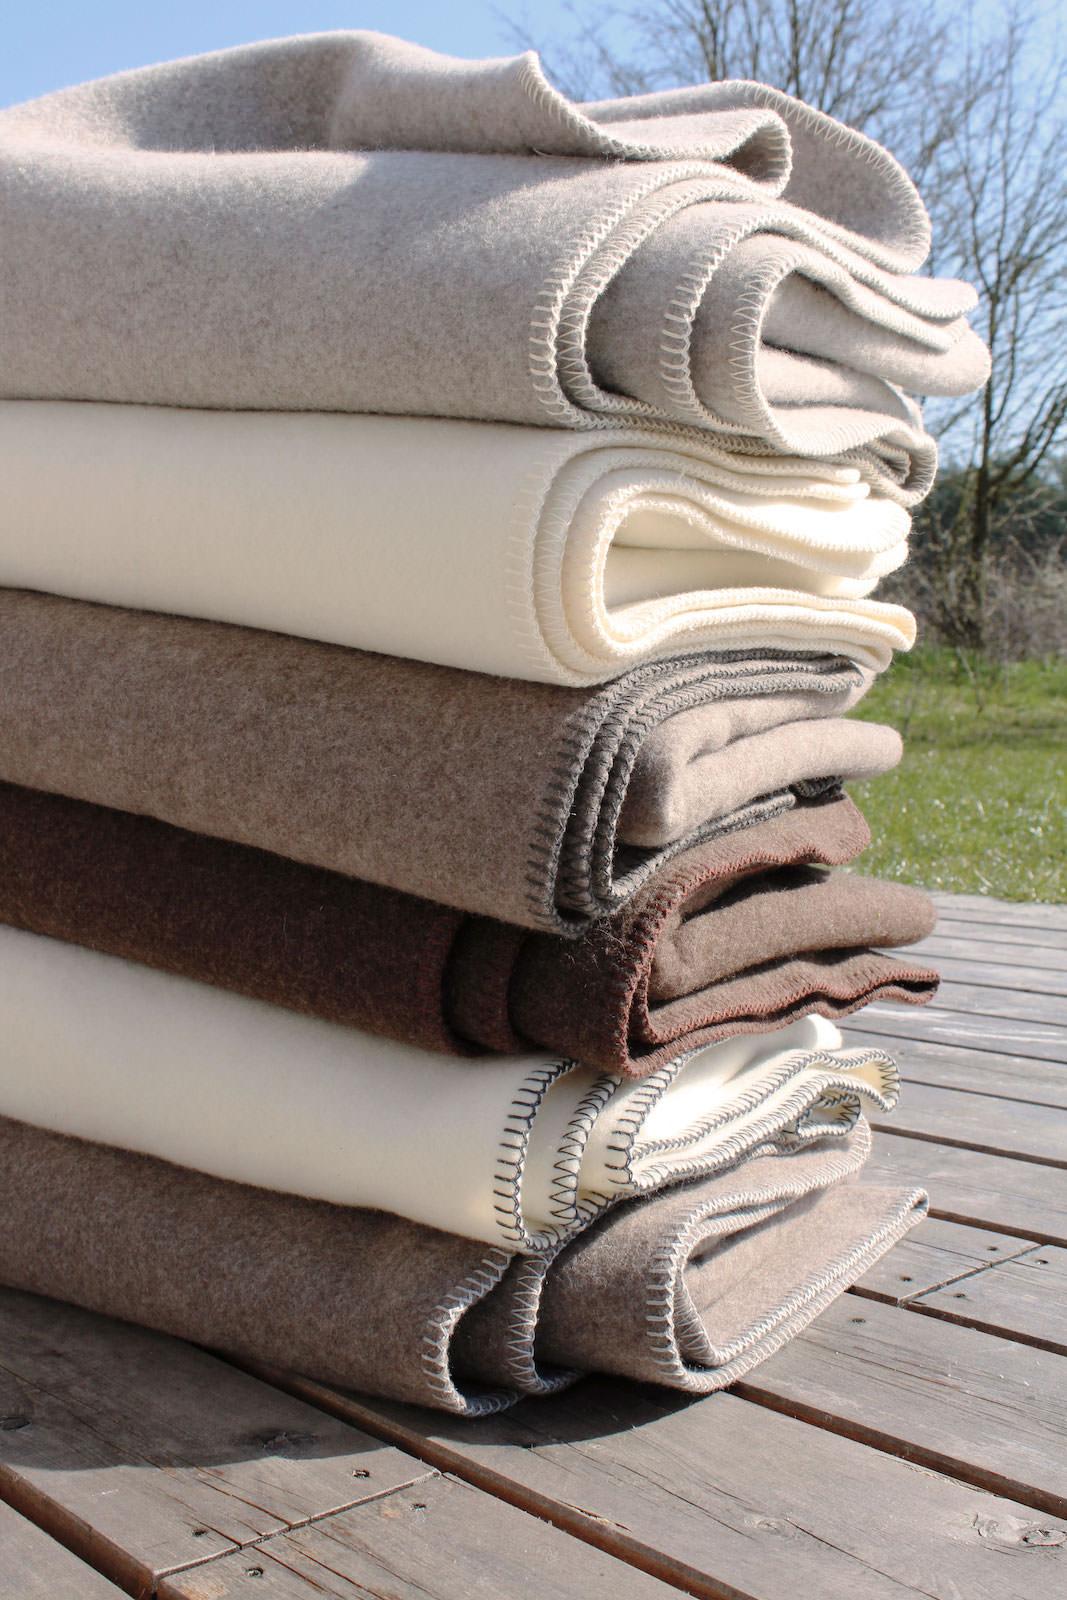 Die halbe Decke – Merino-Decke 100 cm x 155 cm (800 g)